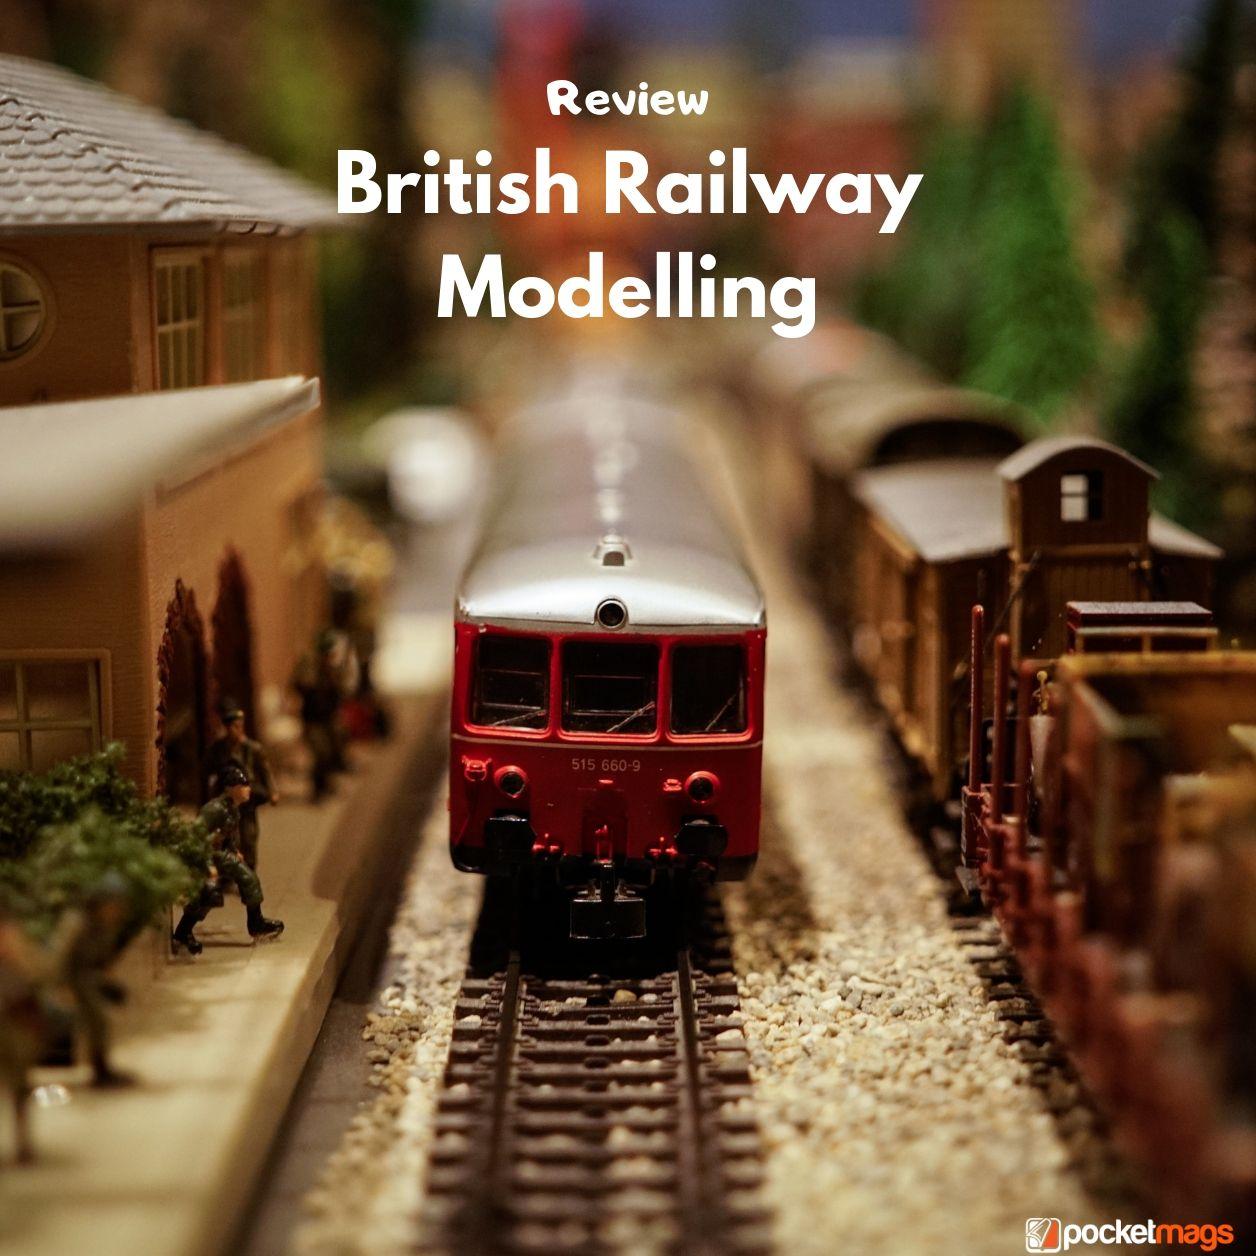 British Railway Modelling Review